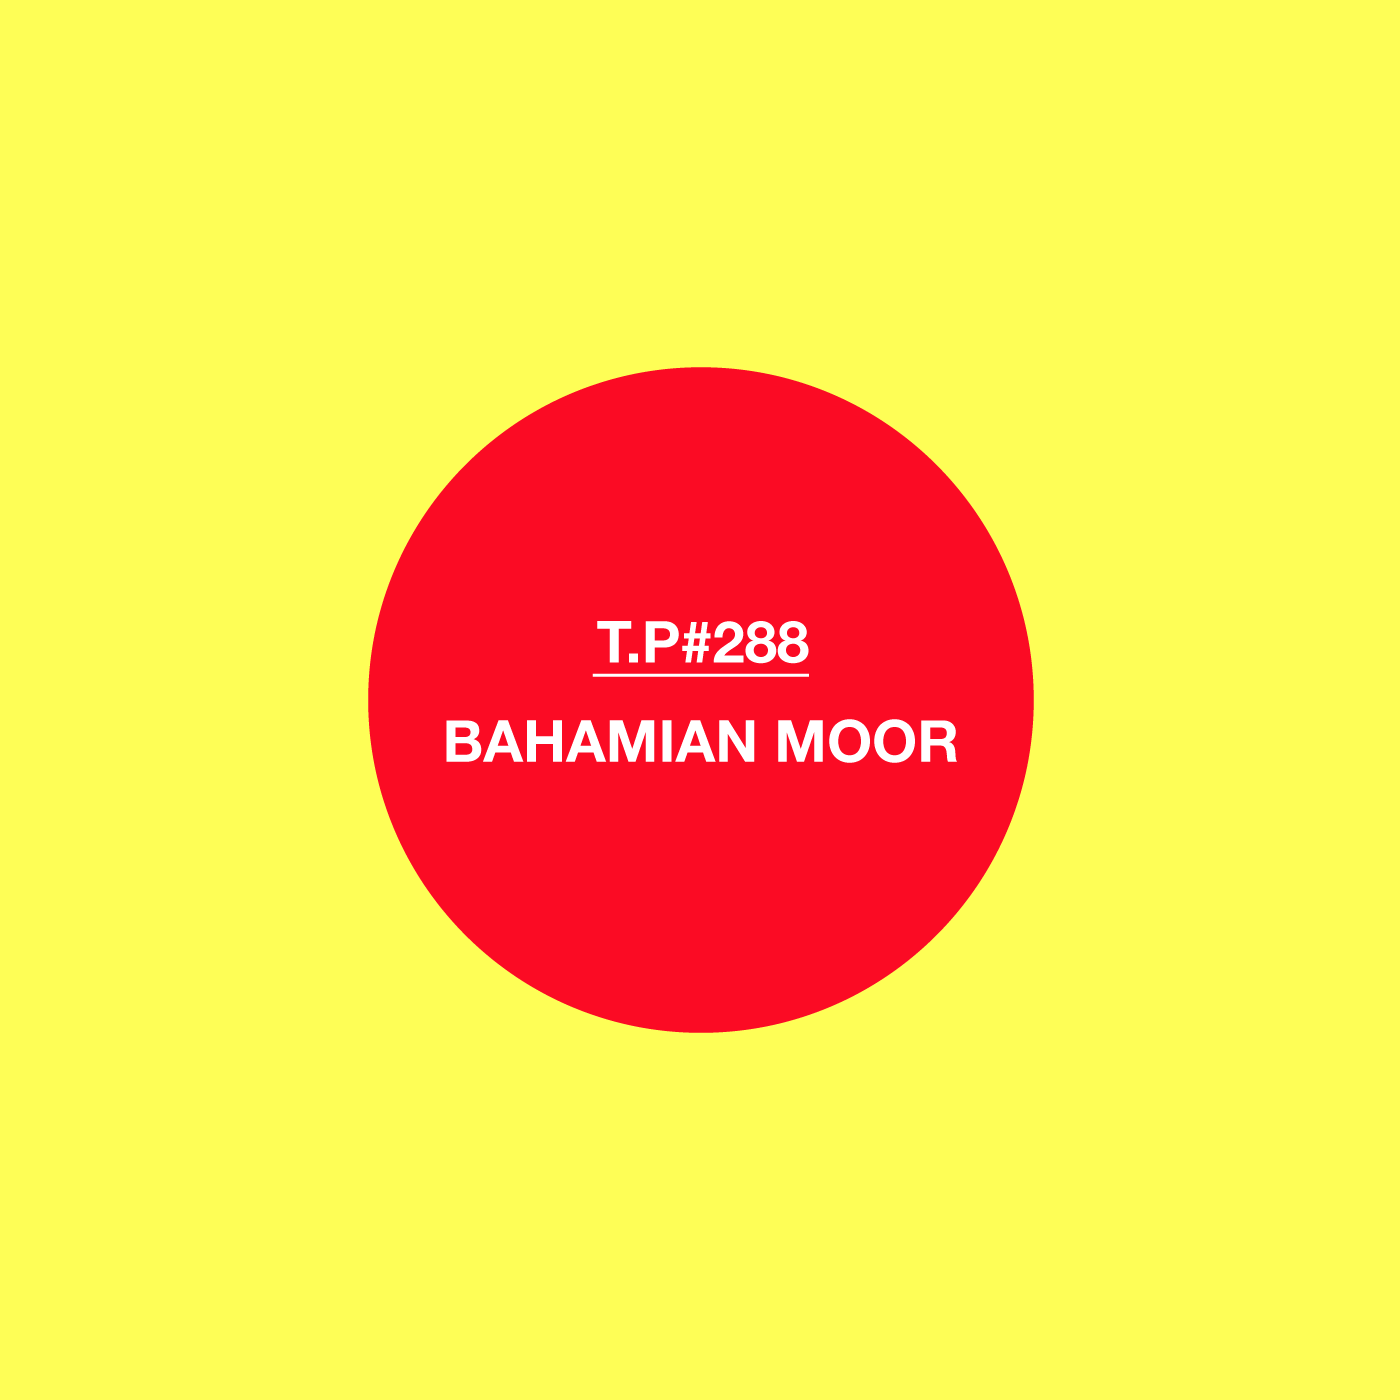 Mix, 288, Bahamian Moor, Spanish, Baleric Beat